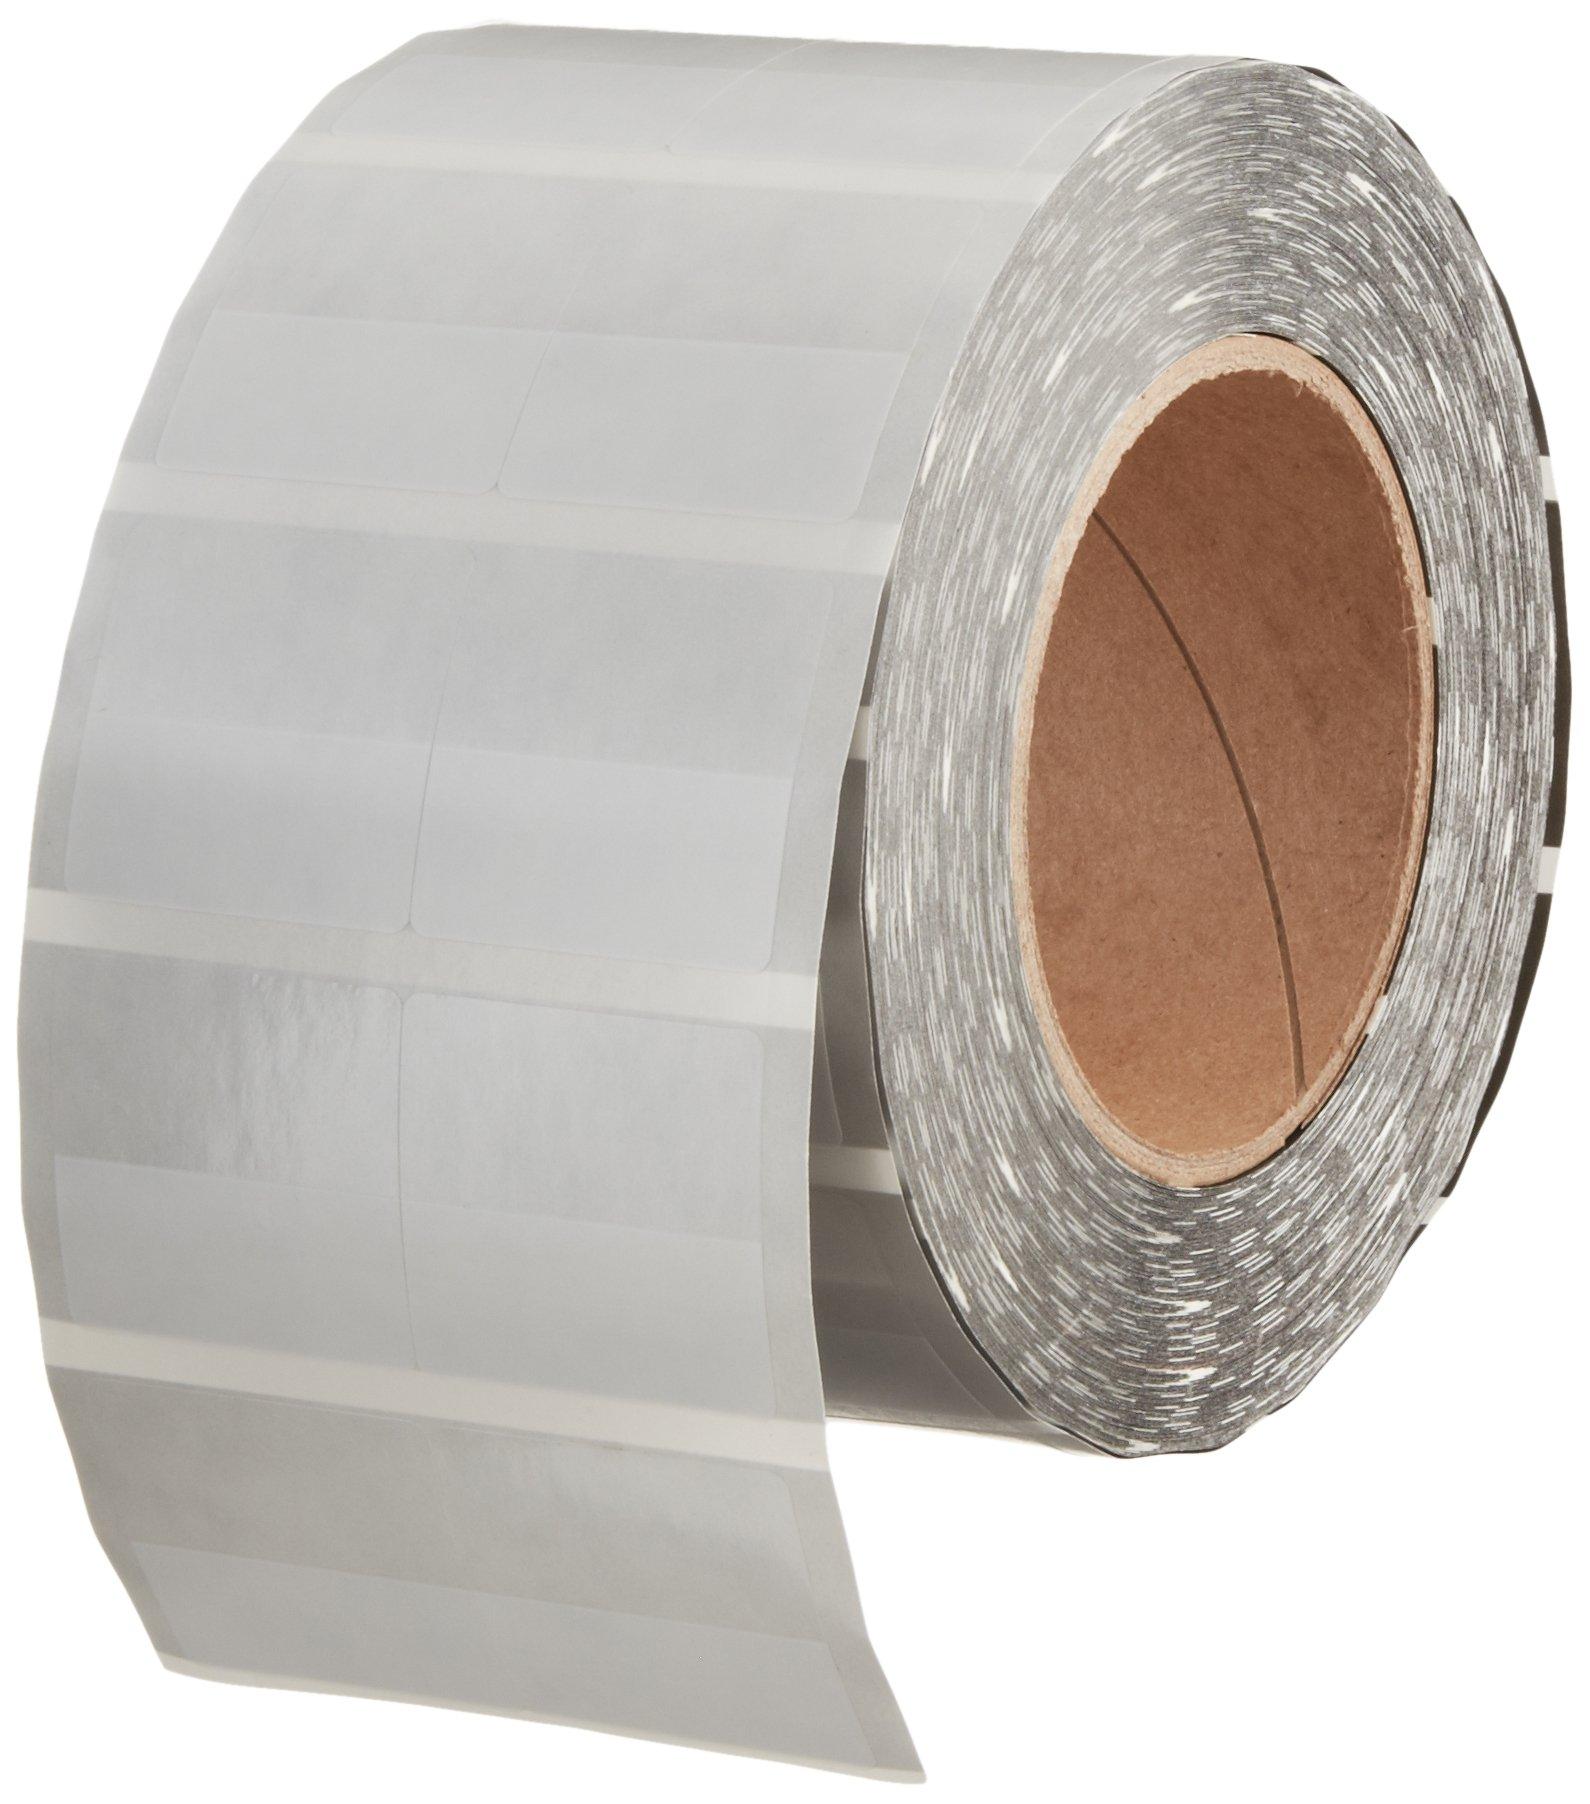 Hellermann Tyton TAG53T2-100B Thermal Transfer Self-Laminating Label, 1.5'' X .7'' X 1.437'', 2 Across, Vinyl, White  (Pack of 2500)